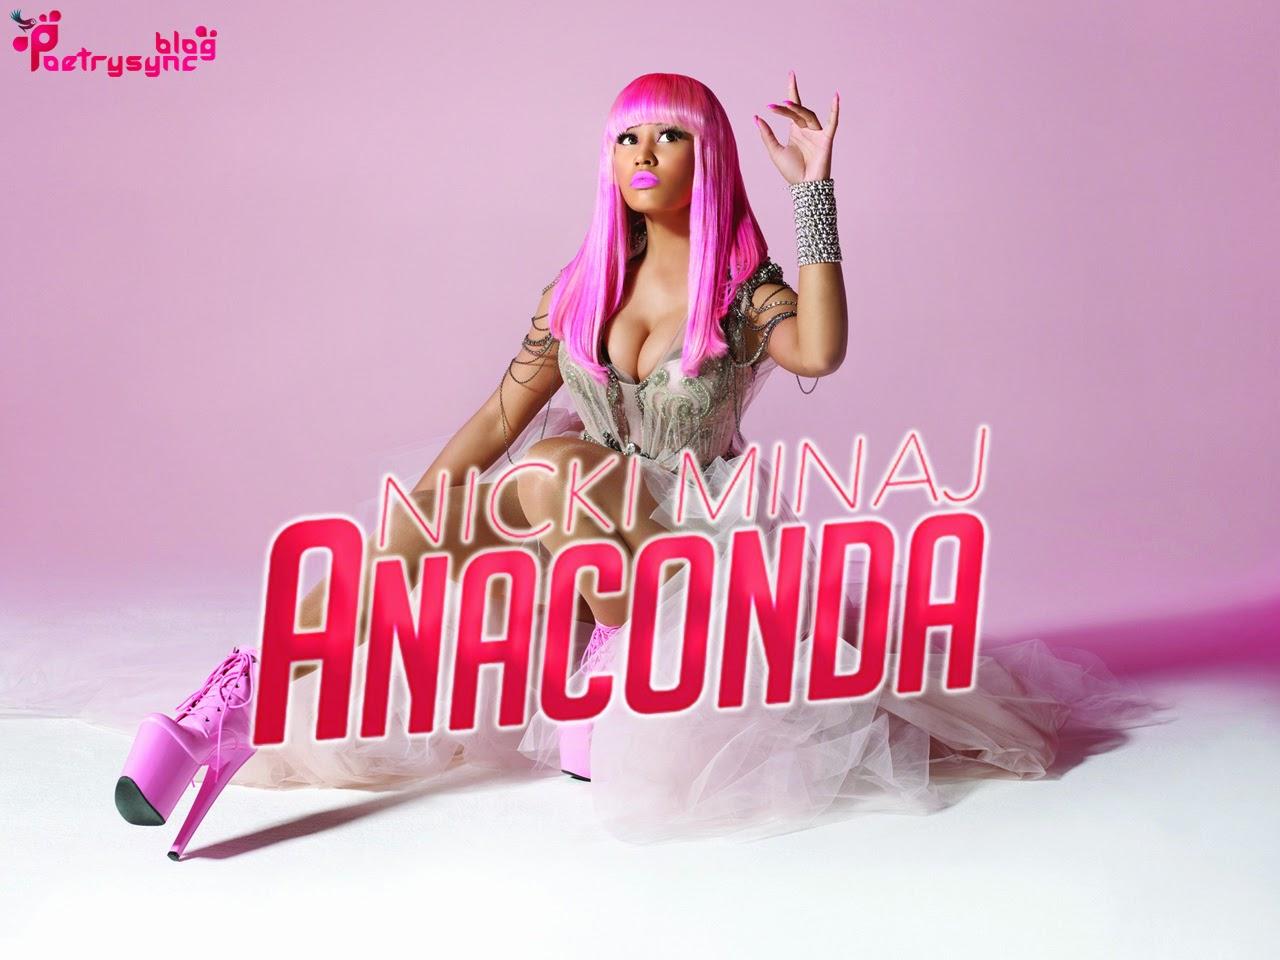 My anaconda don't song lyrics and mp3 by nicki minaj the.